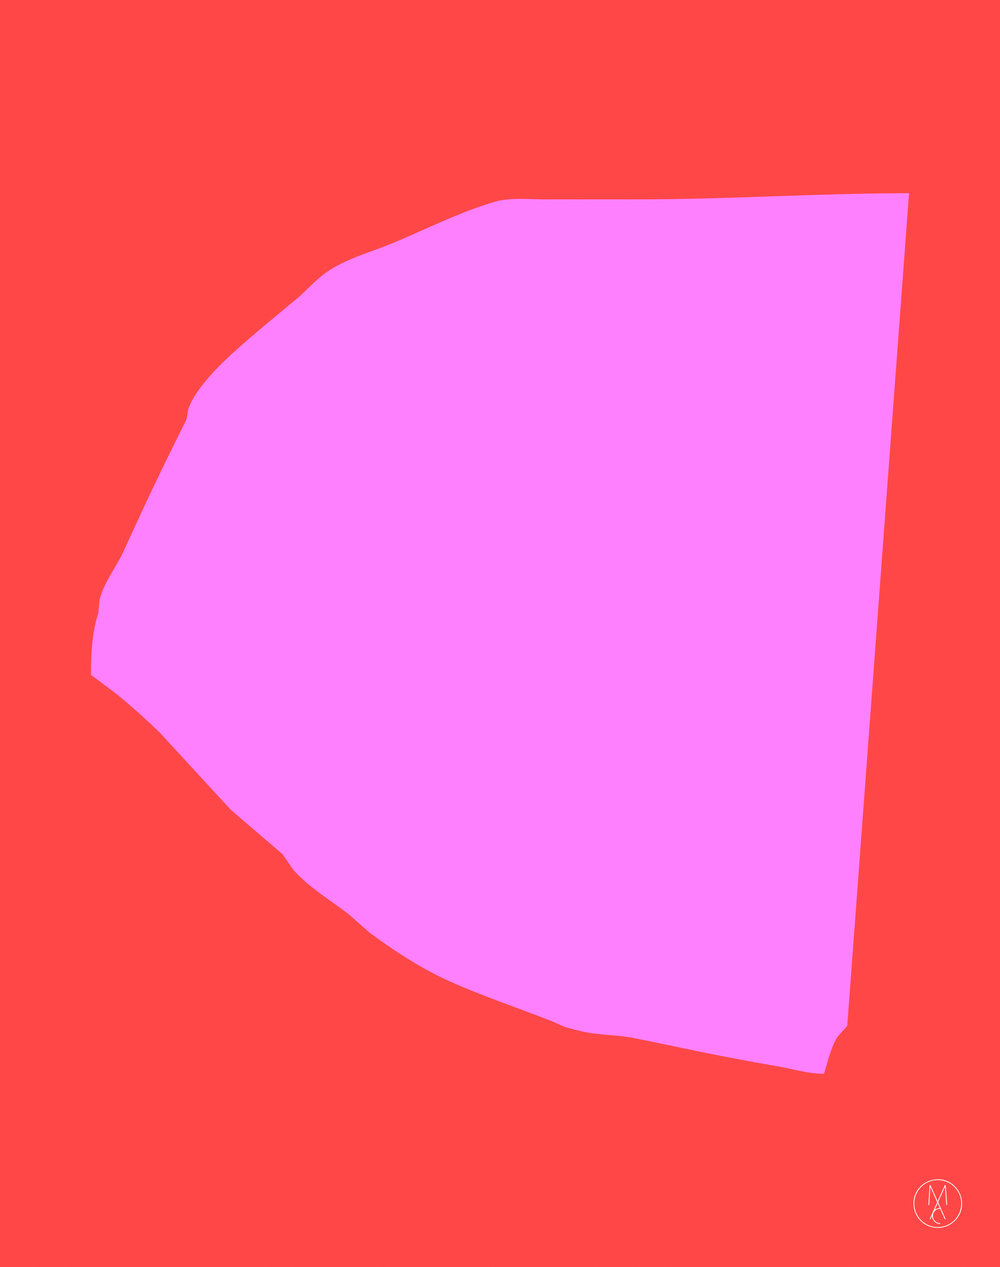 persimmon_mculver_poster_07.jpg